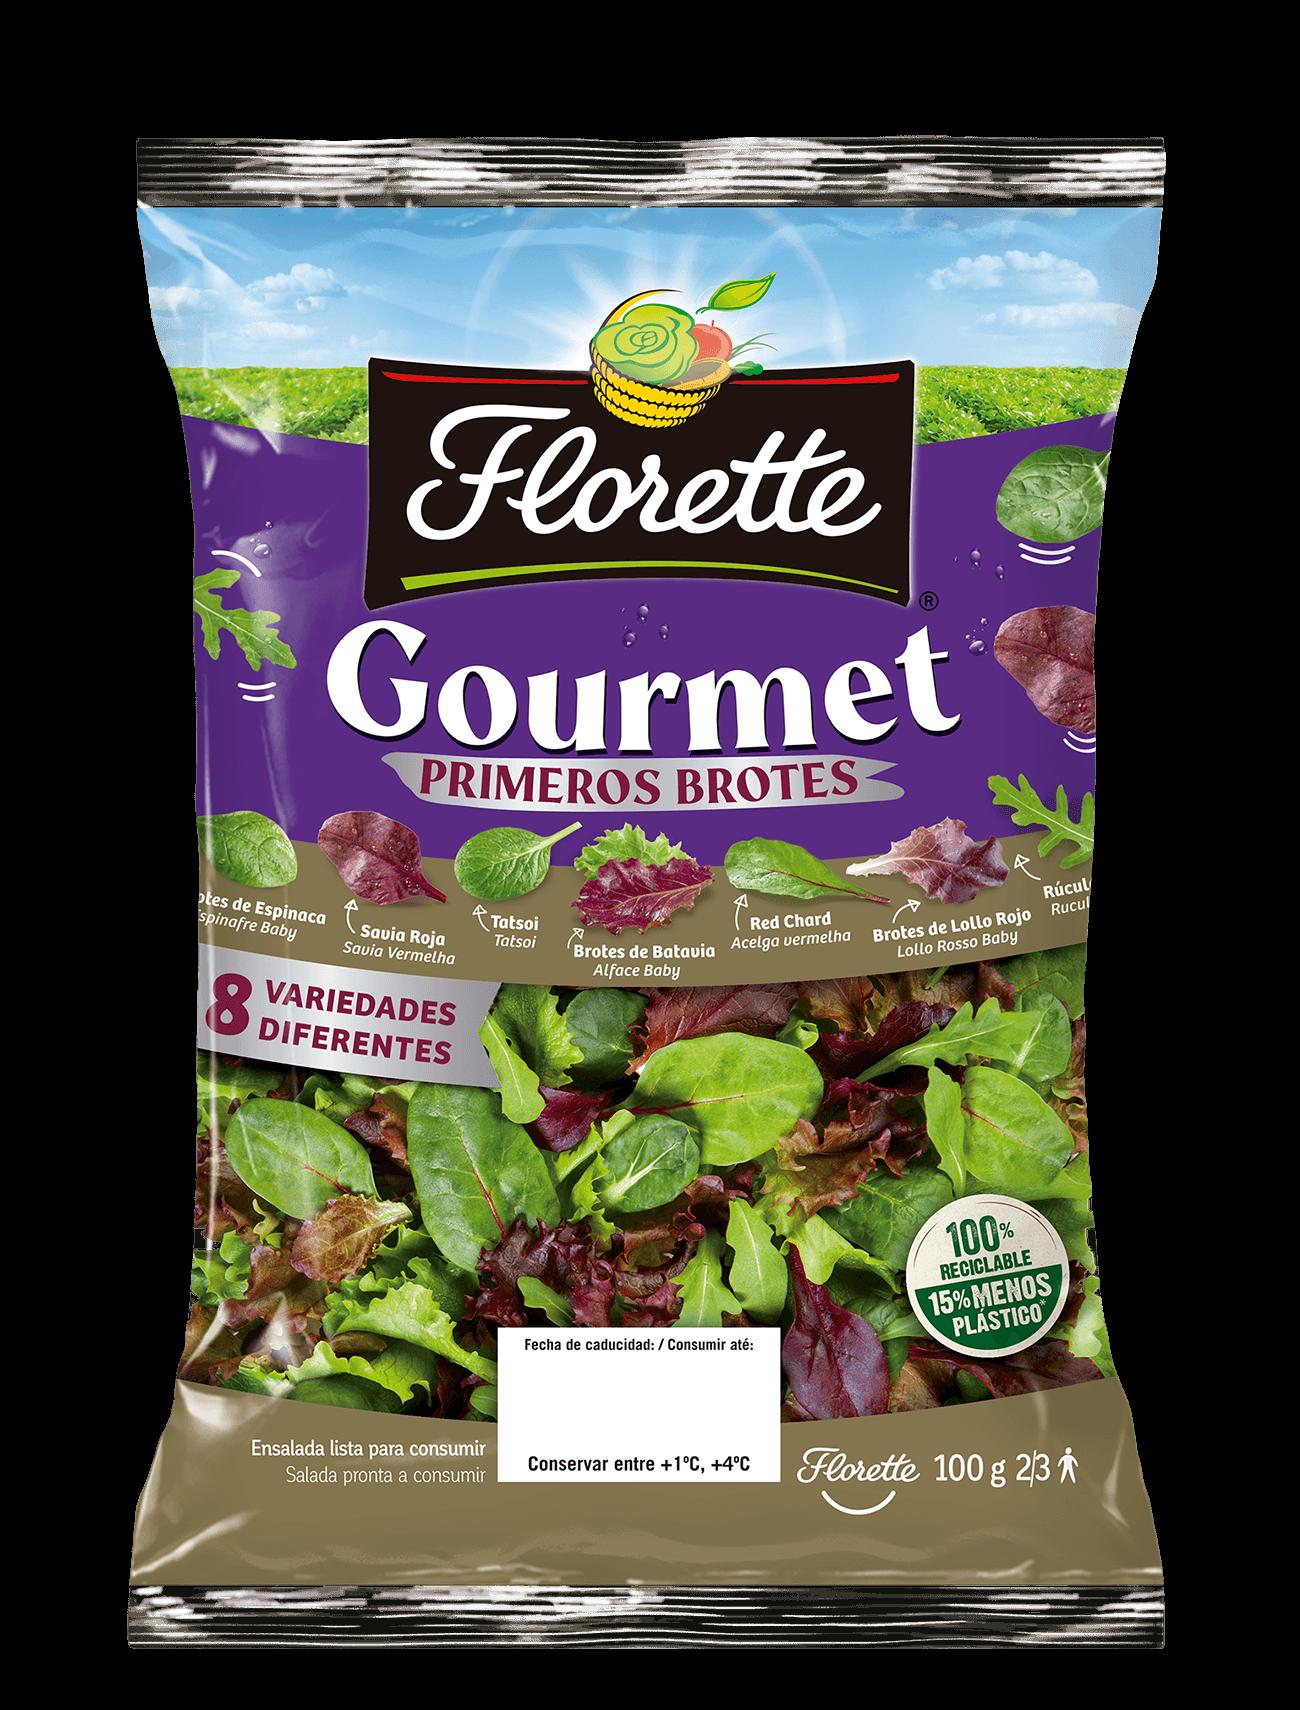 Bolsa de ensalada gourmet con primeros brotes de lollo rojo, rucula, red chard, savia roja, espinaca, tatsoi, batavia roja, y batavia verde.